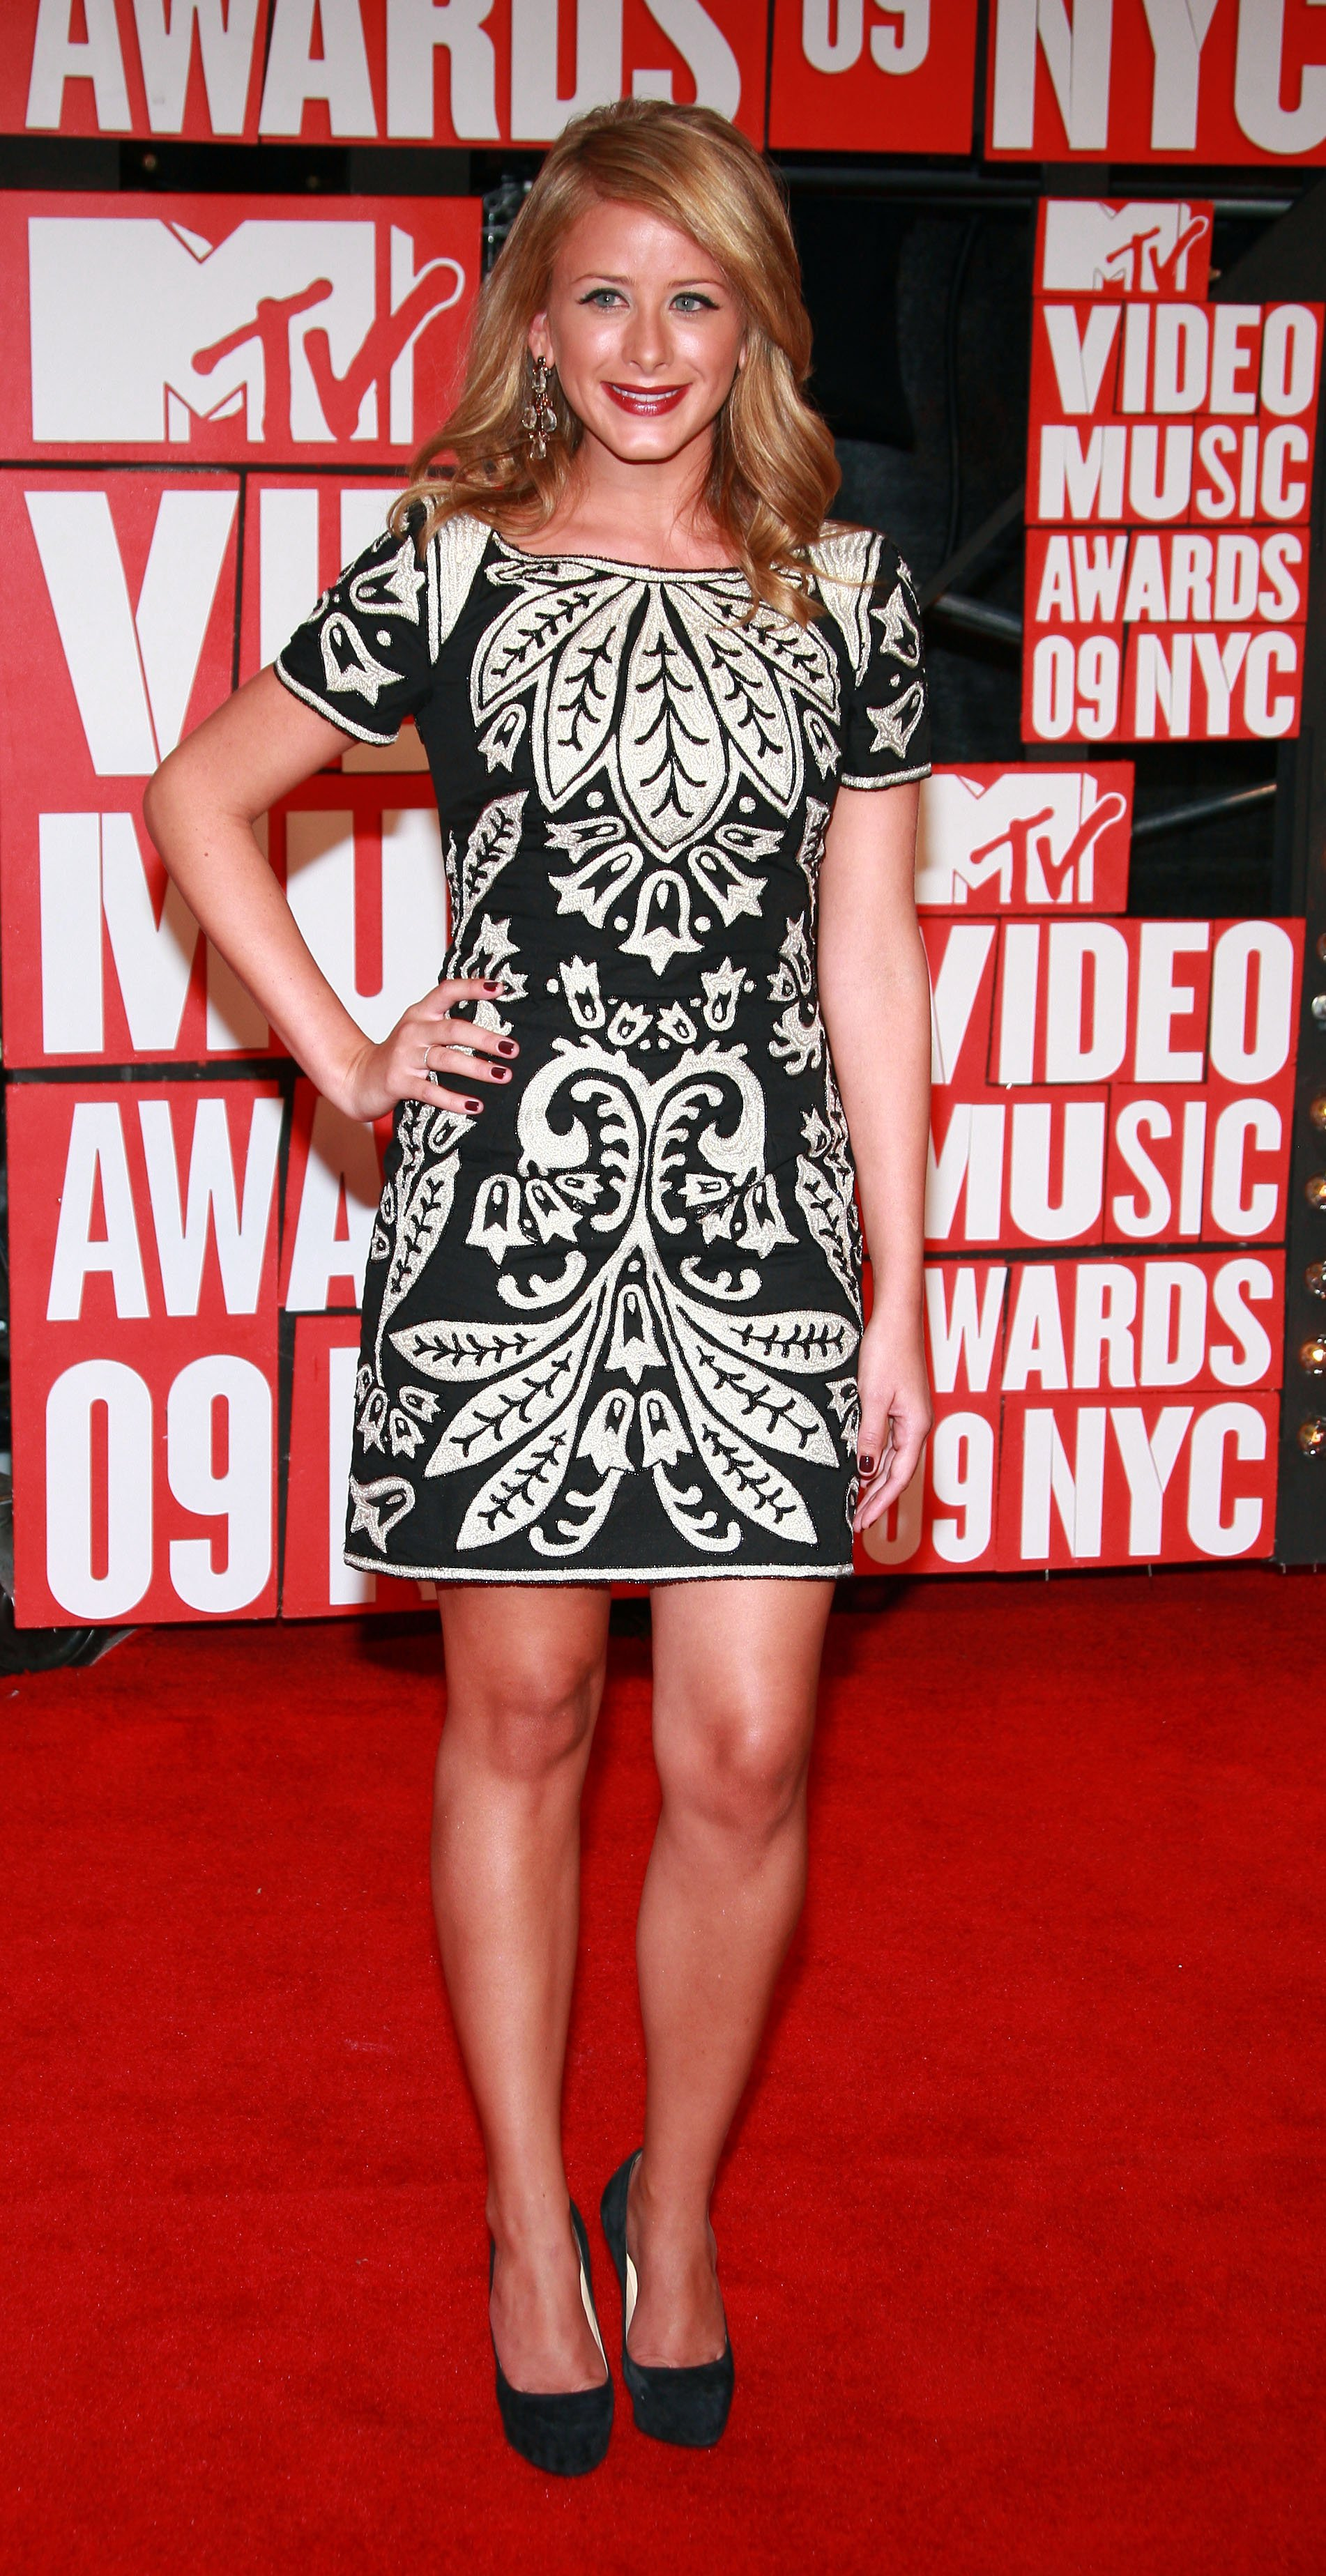 87338_Celebutopia-Lauren_Bosworth_arrives_at_the_2009_MTV_Video_Music_Awards-03_122_409lo.jpg